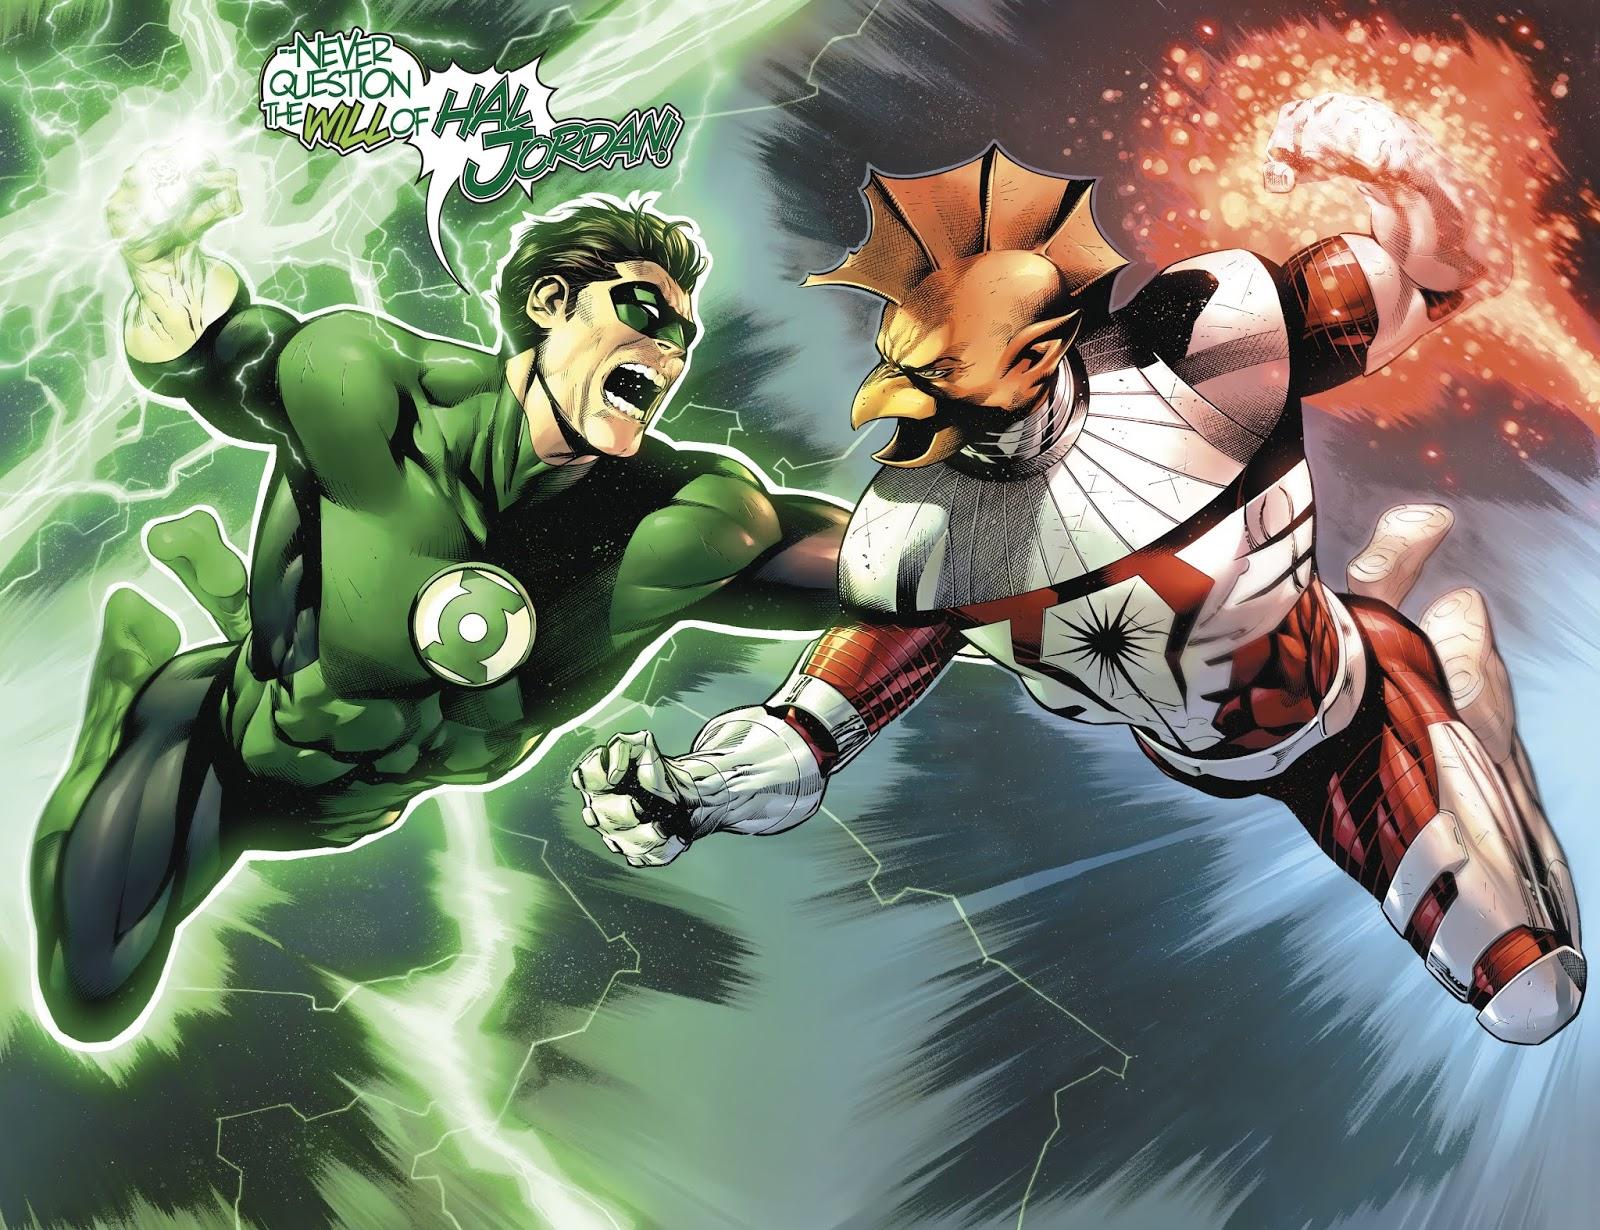 Green Lantern Hal Jordan And Darkstar Tomar-Tu